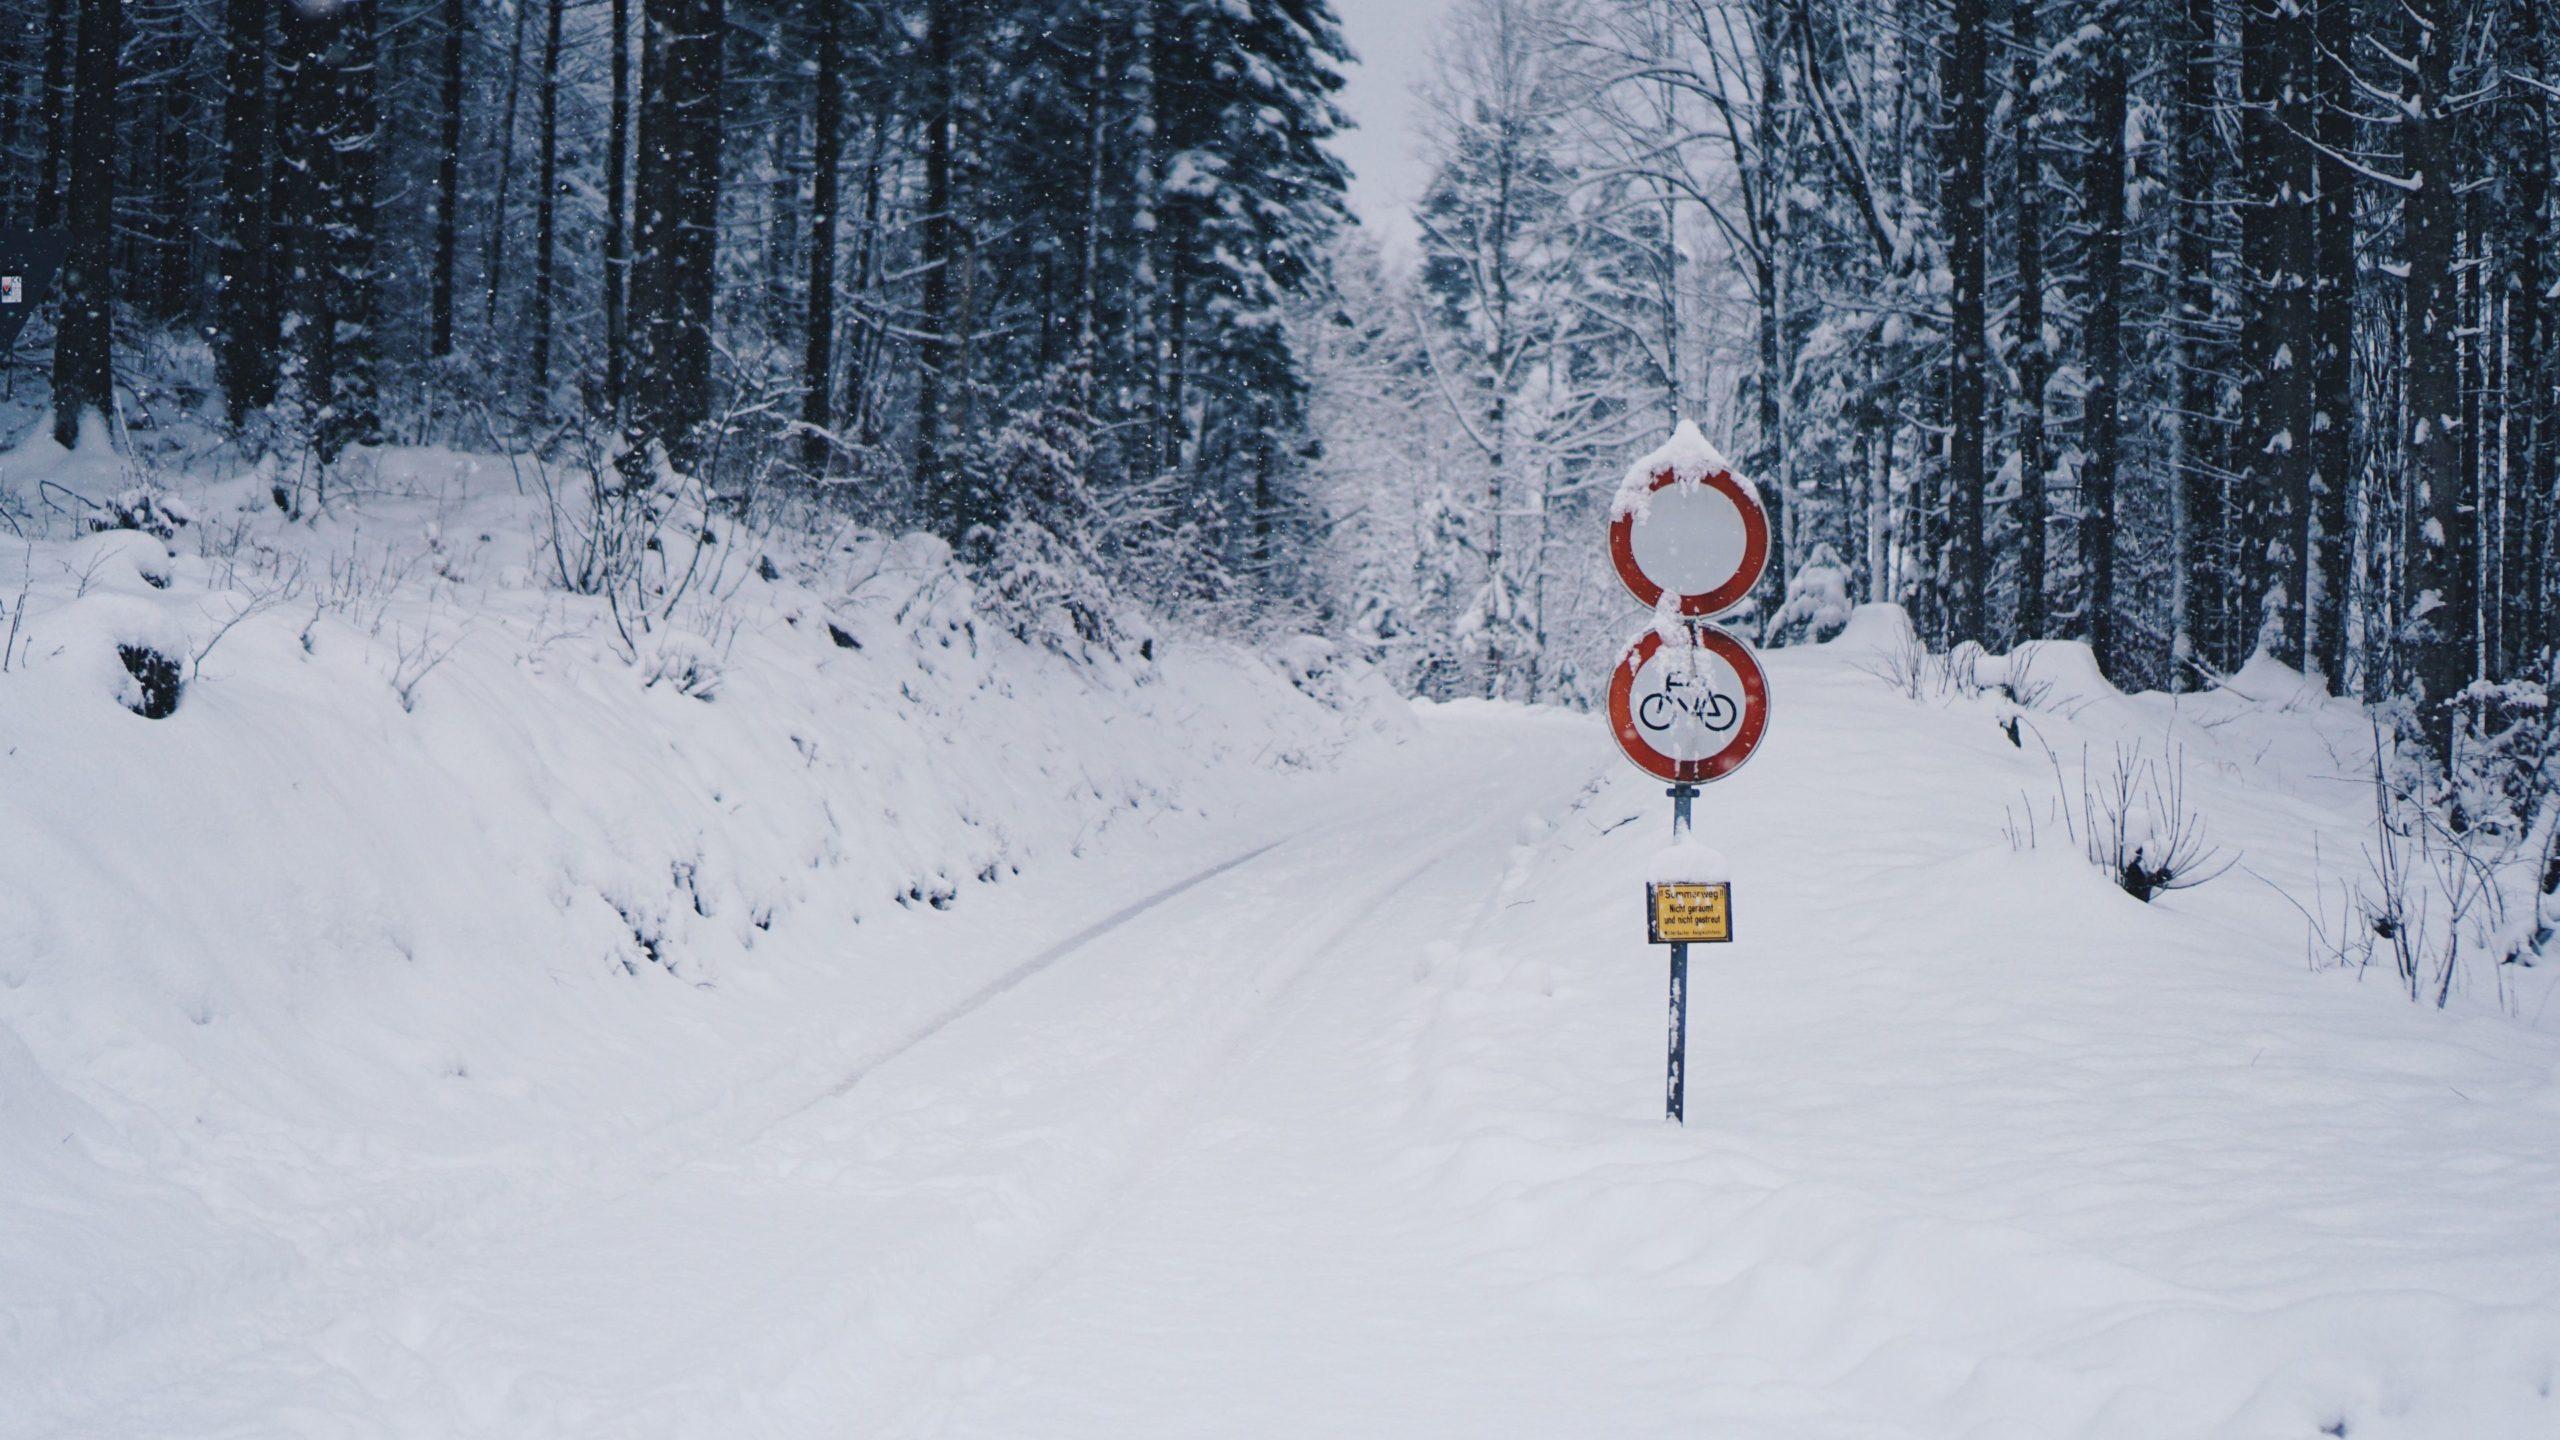 winter snow background hd